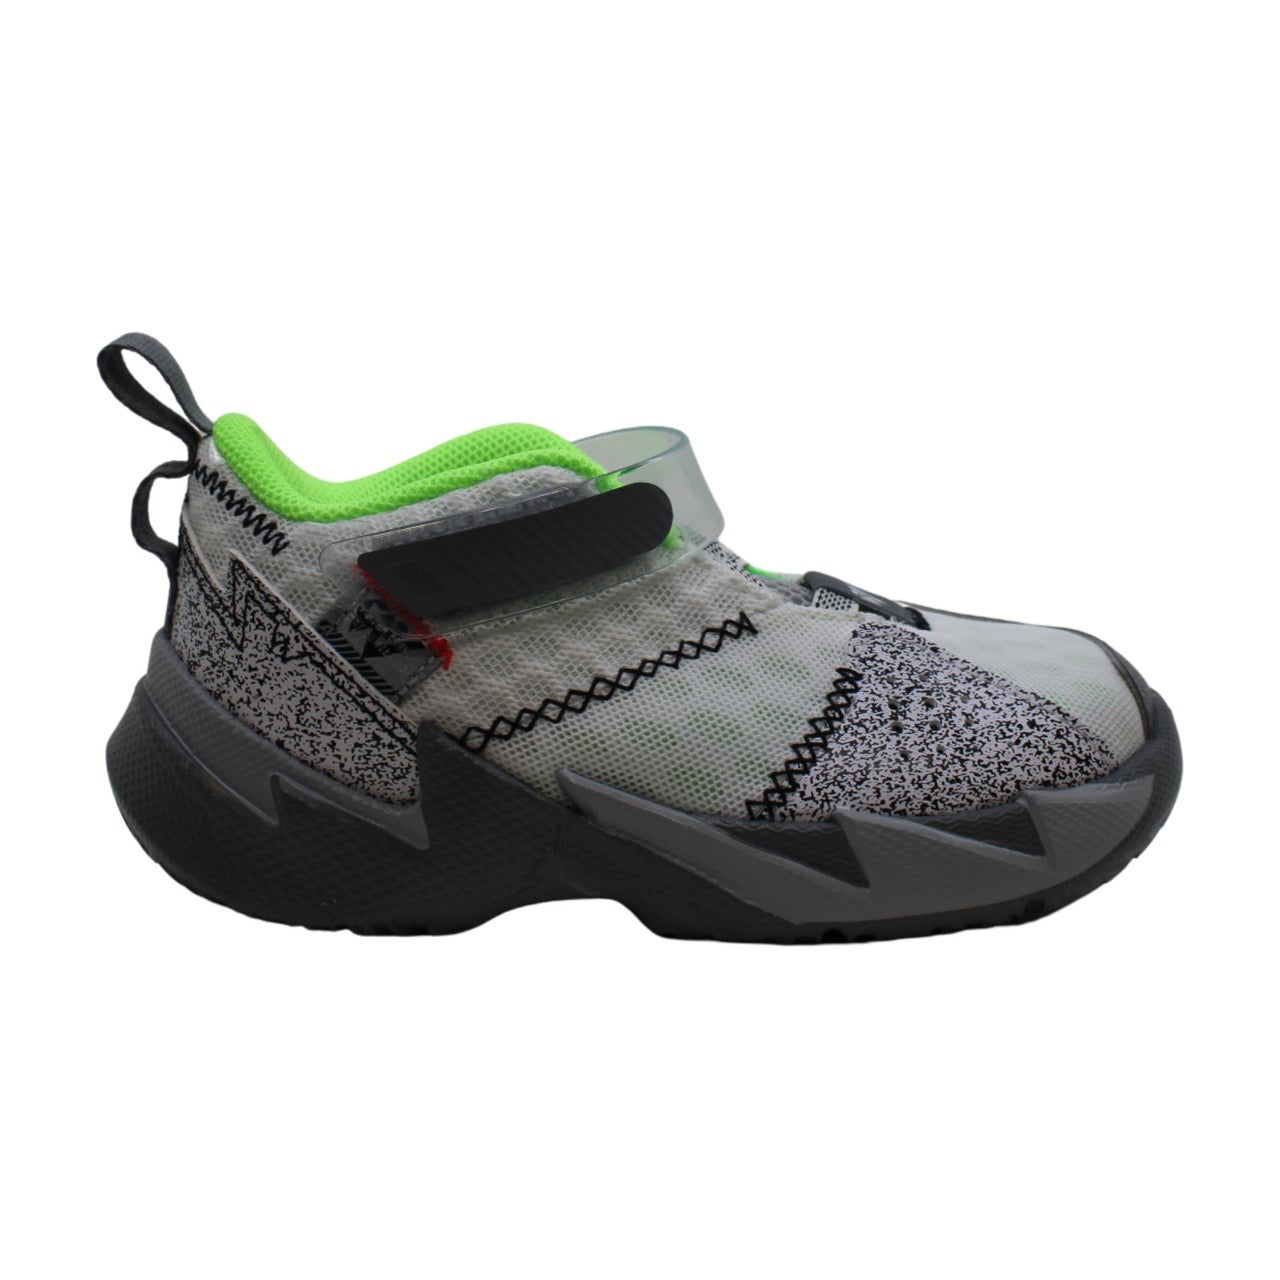 Jordan Children Shoes why not zero.3 - 10